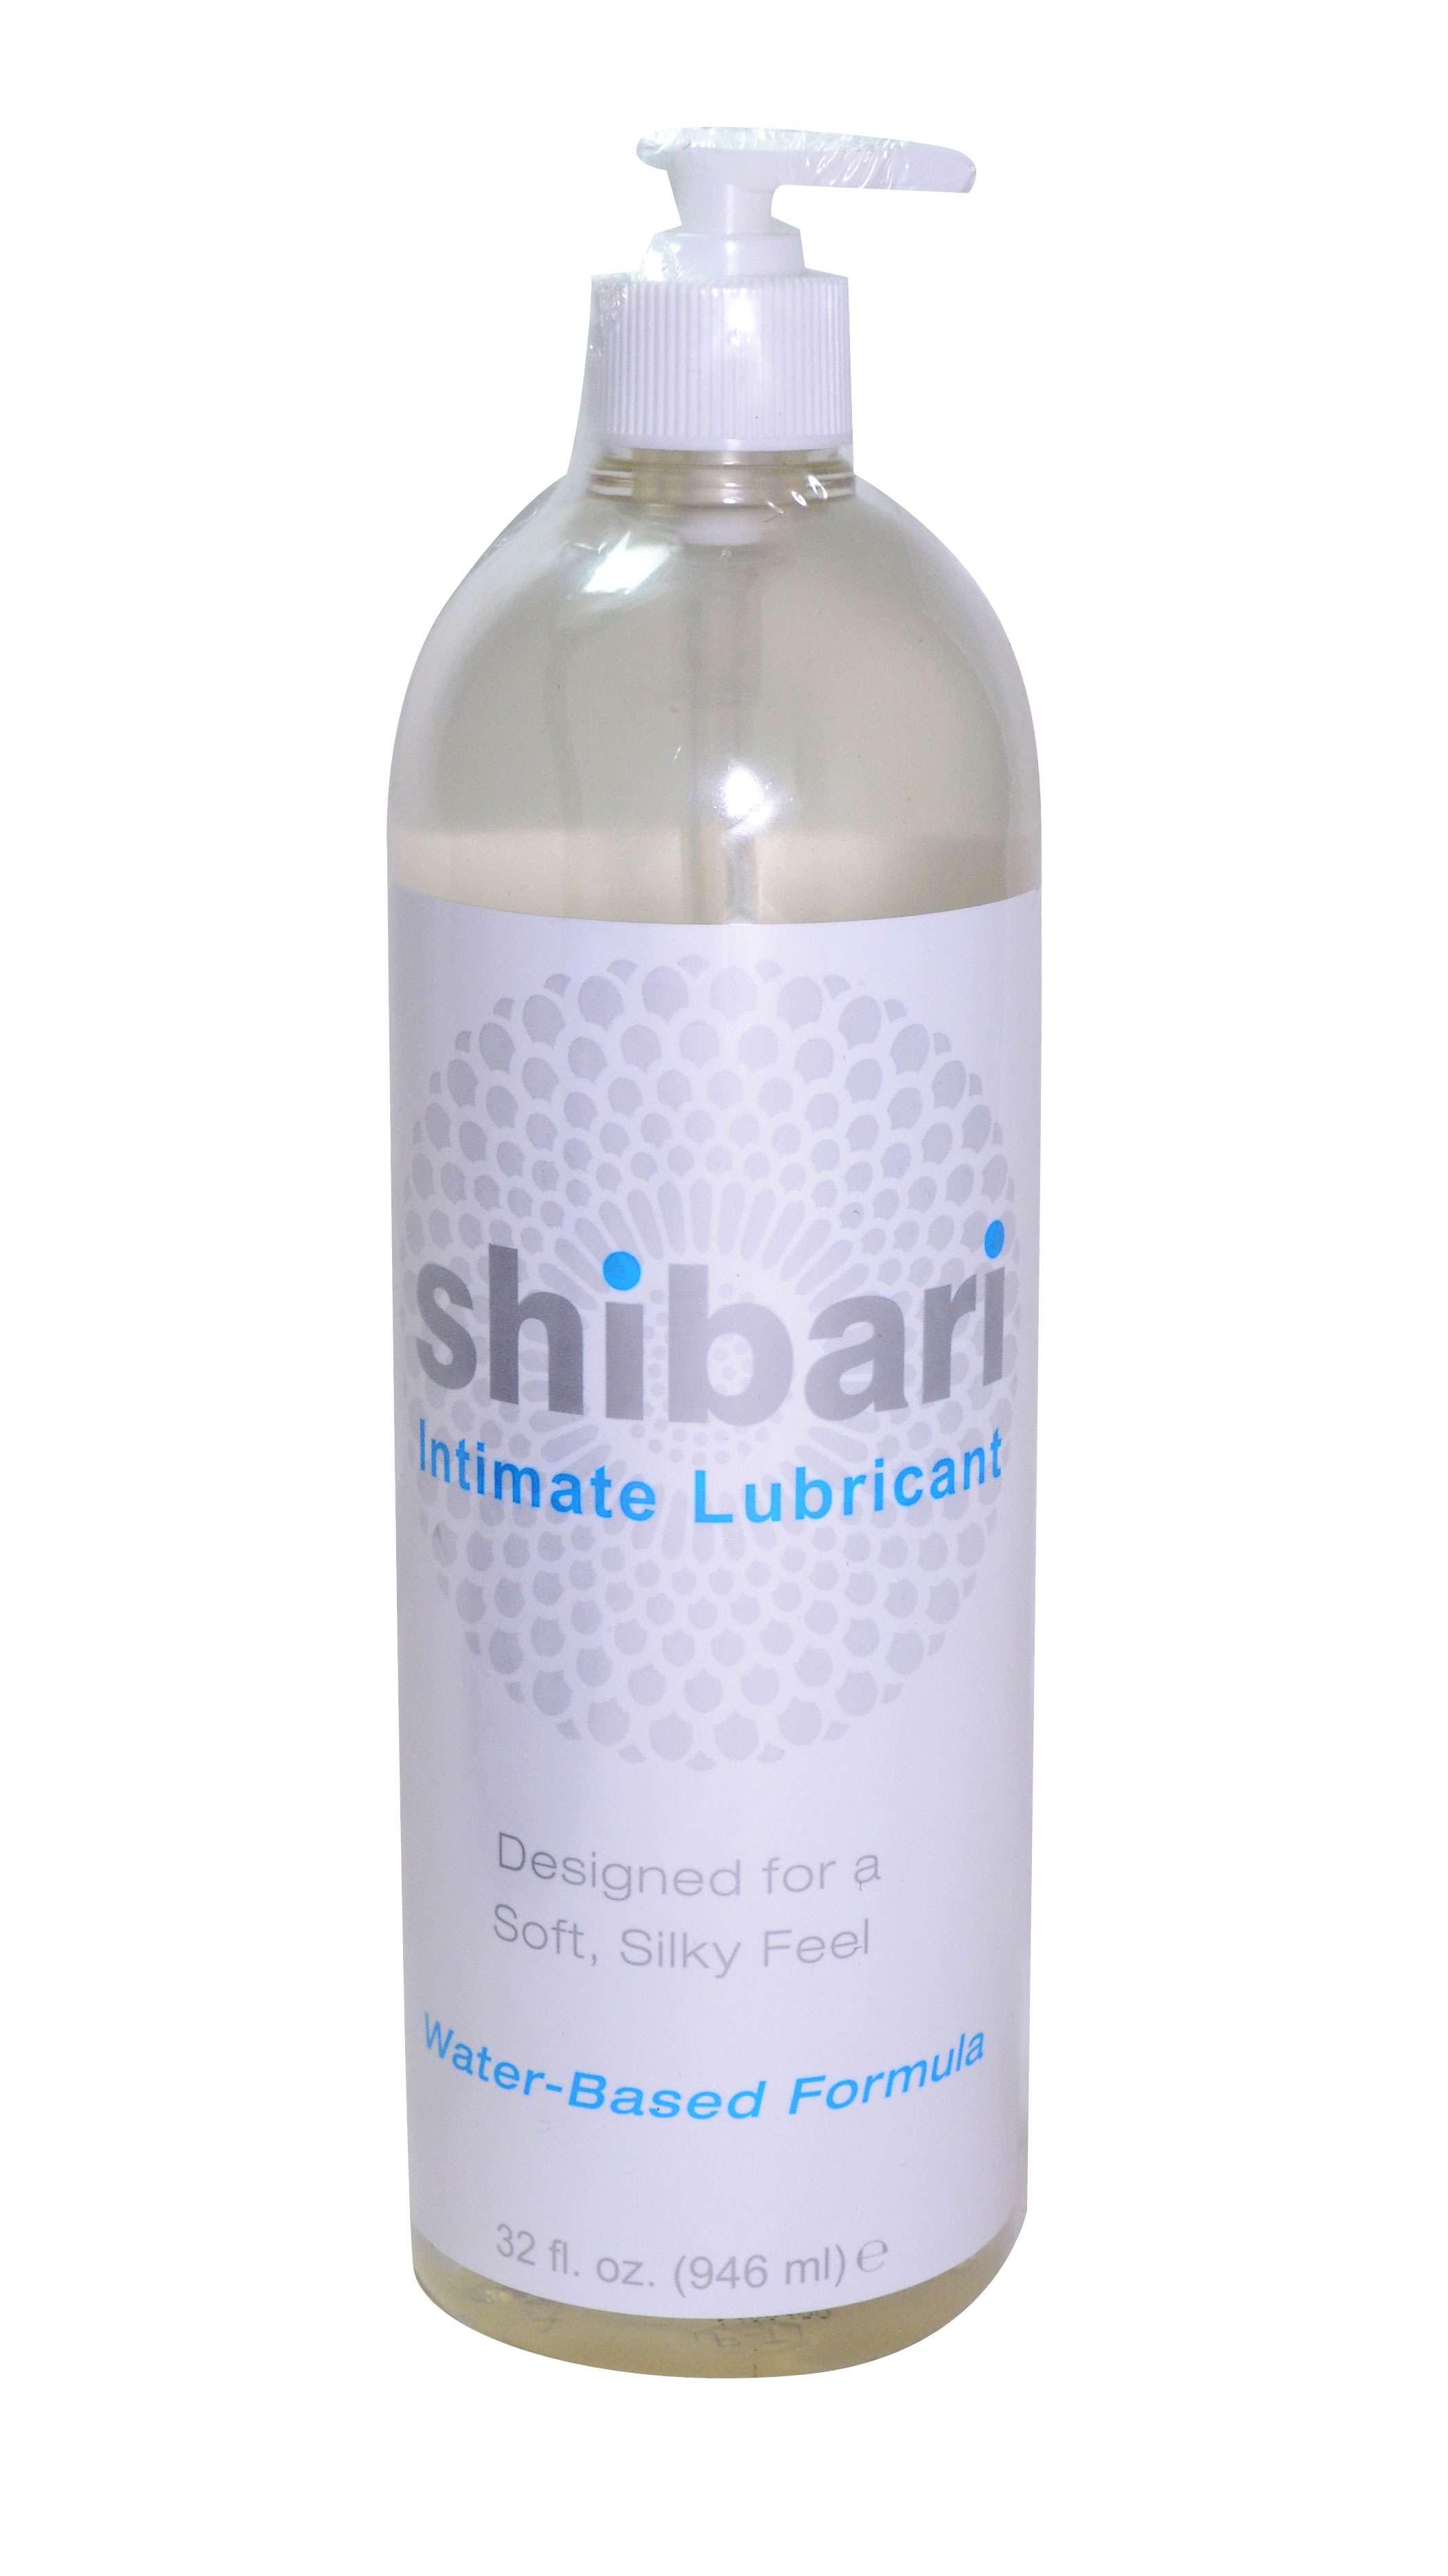 Shibari personal lubricant